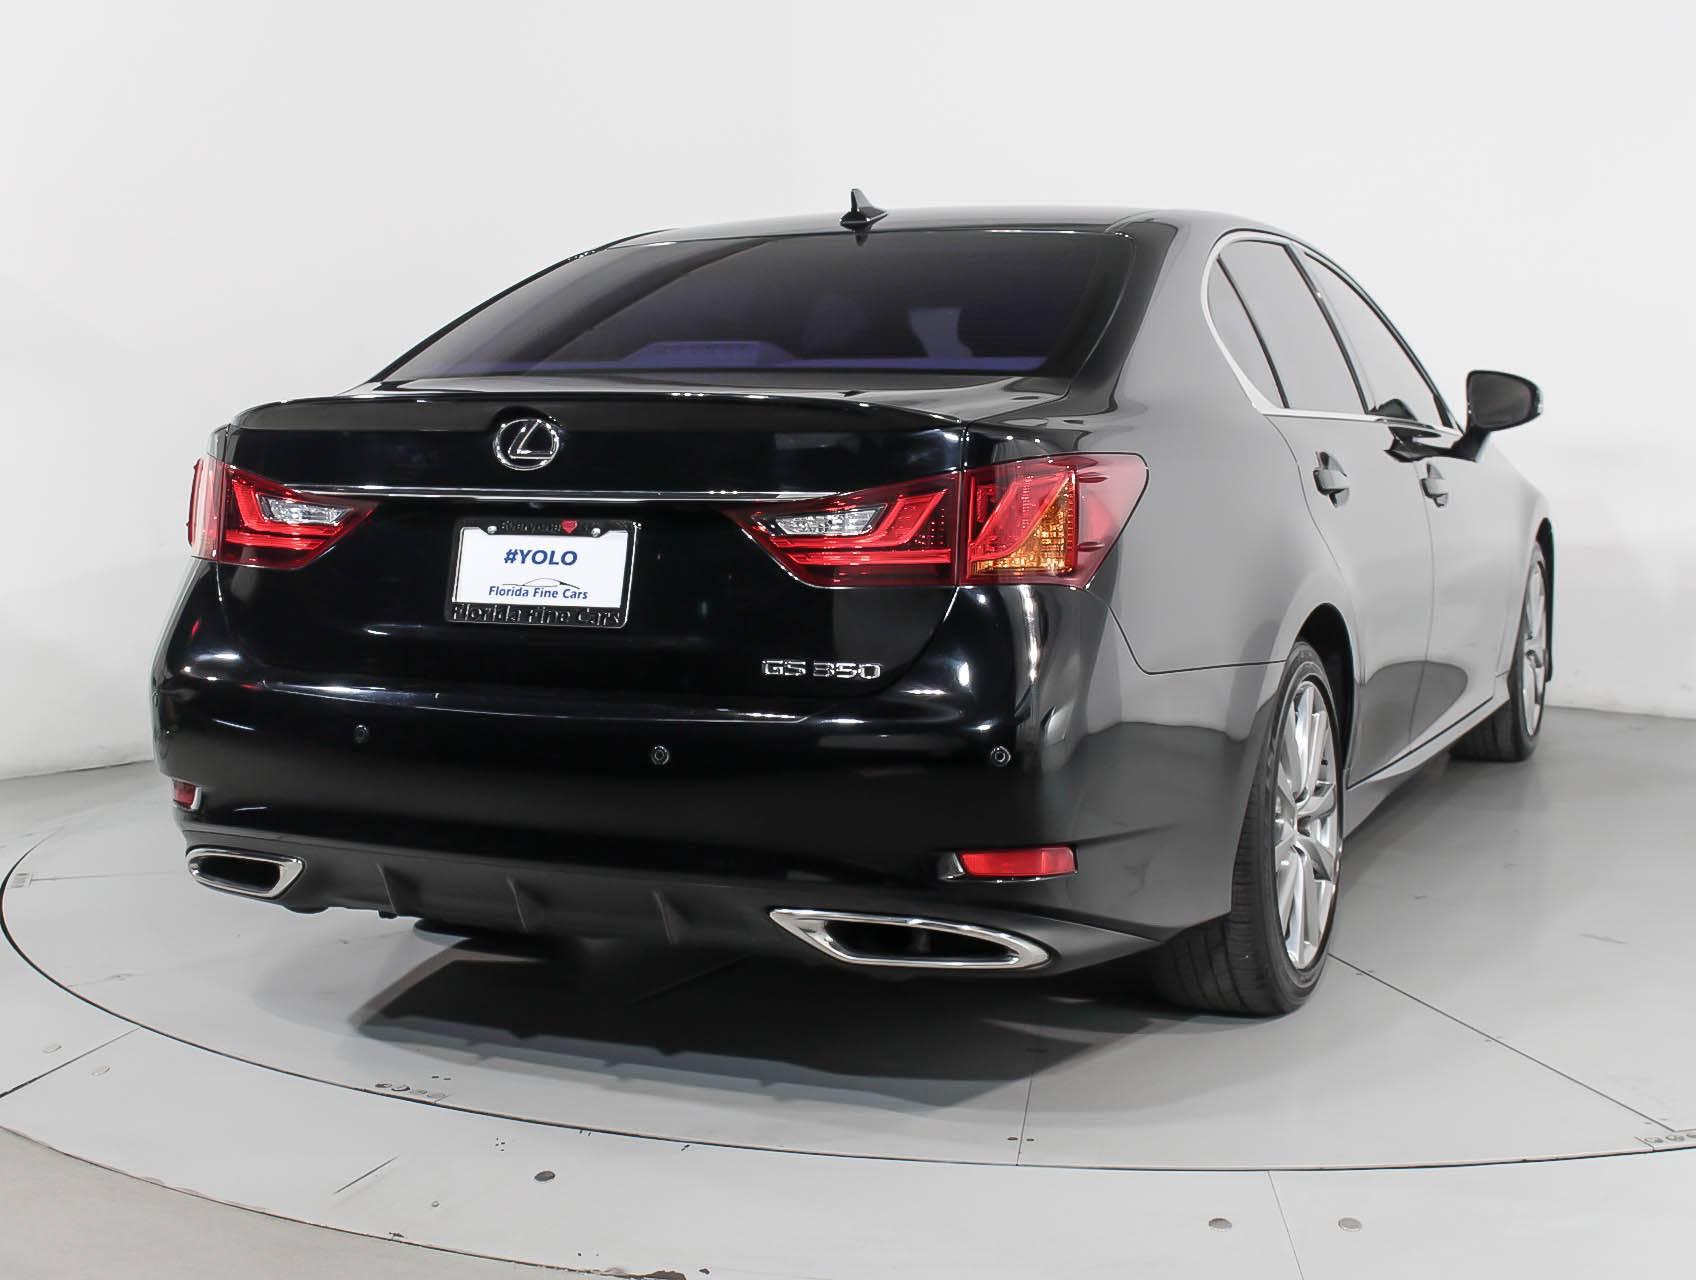 used 2013 lexus gs 350 sedan for sale in miami fl 91866 florida fine cars. Black Bedroom Furniture Sets. Home Design Ideas